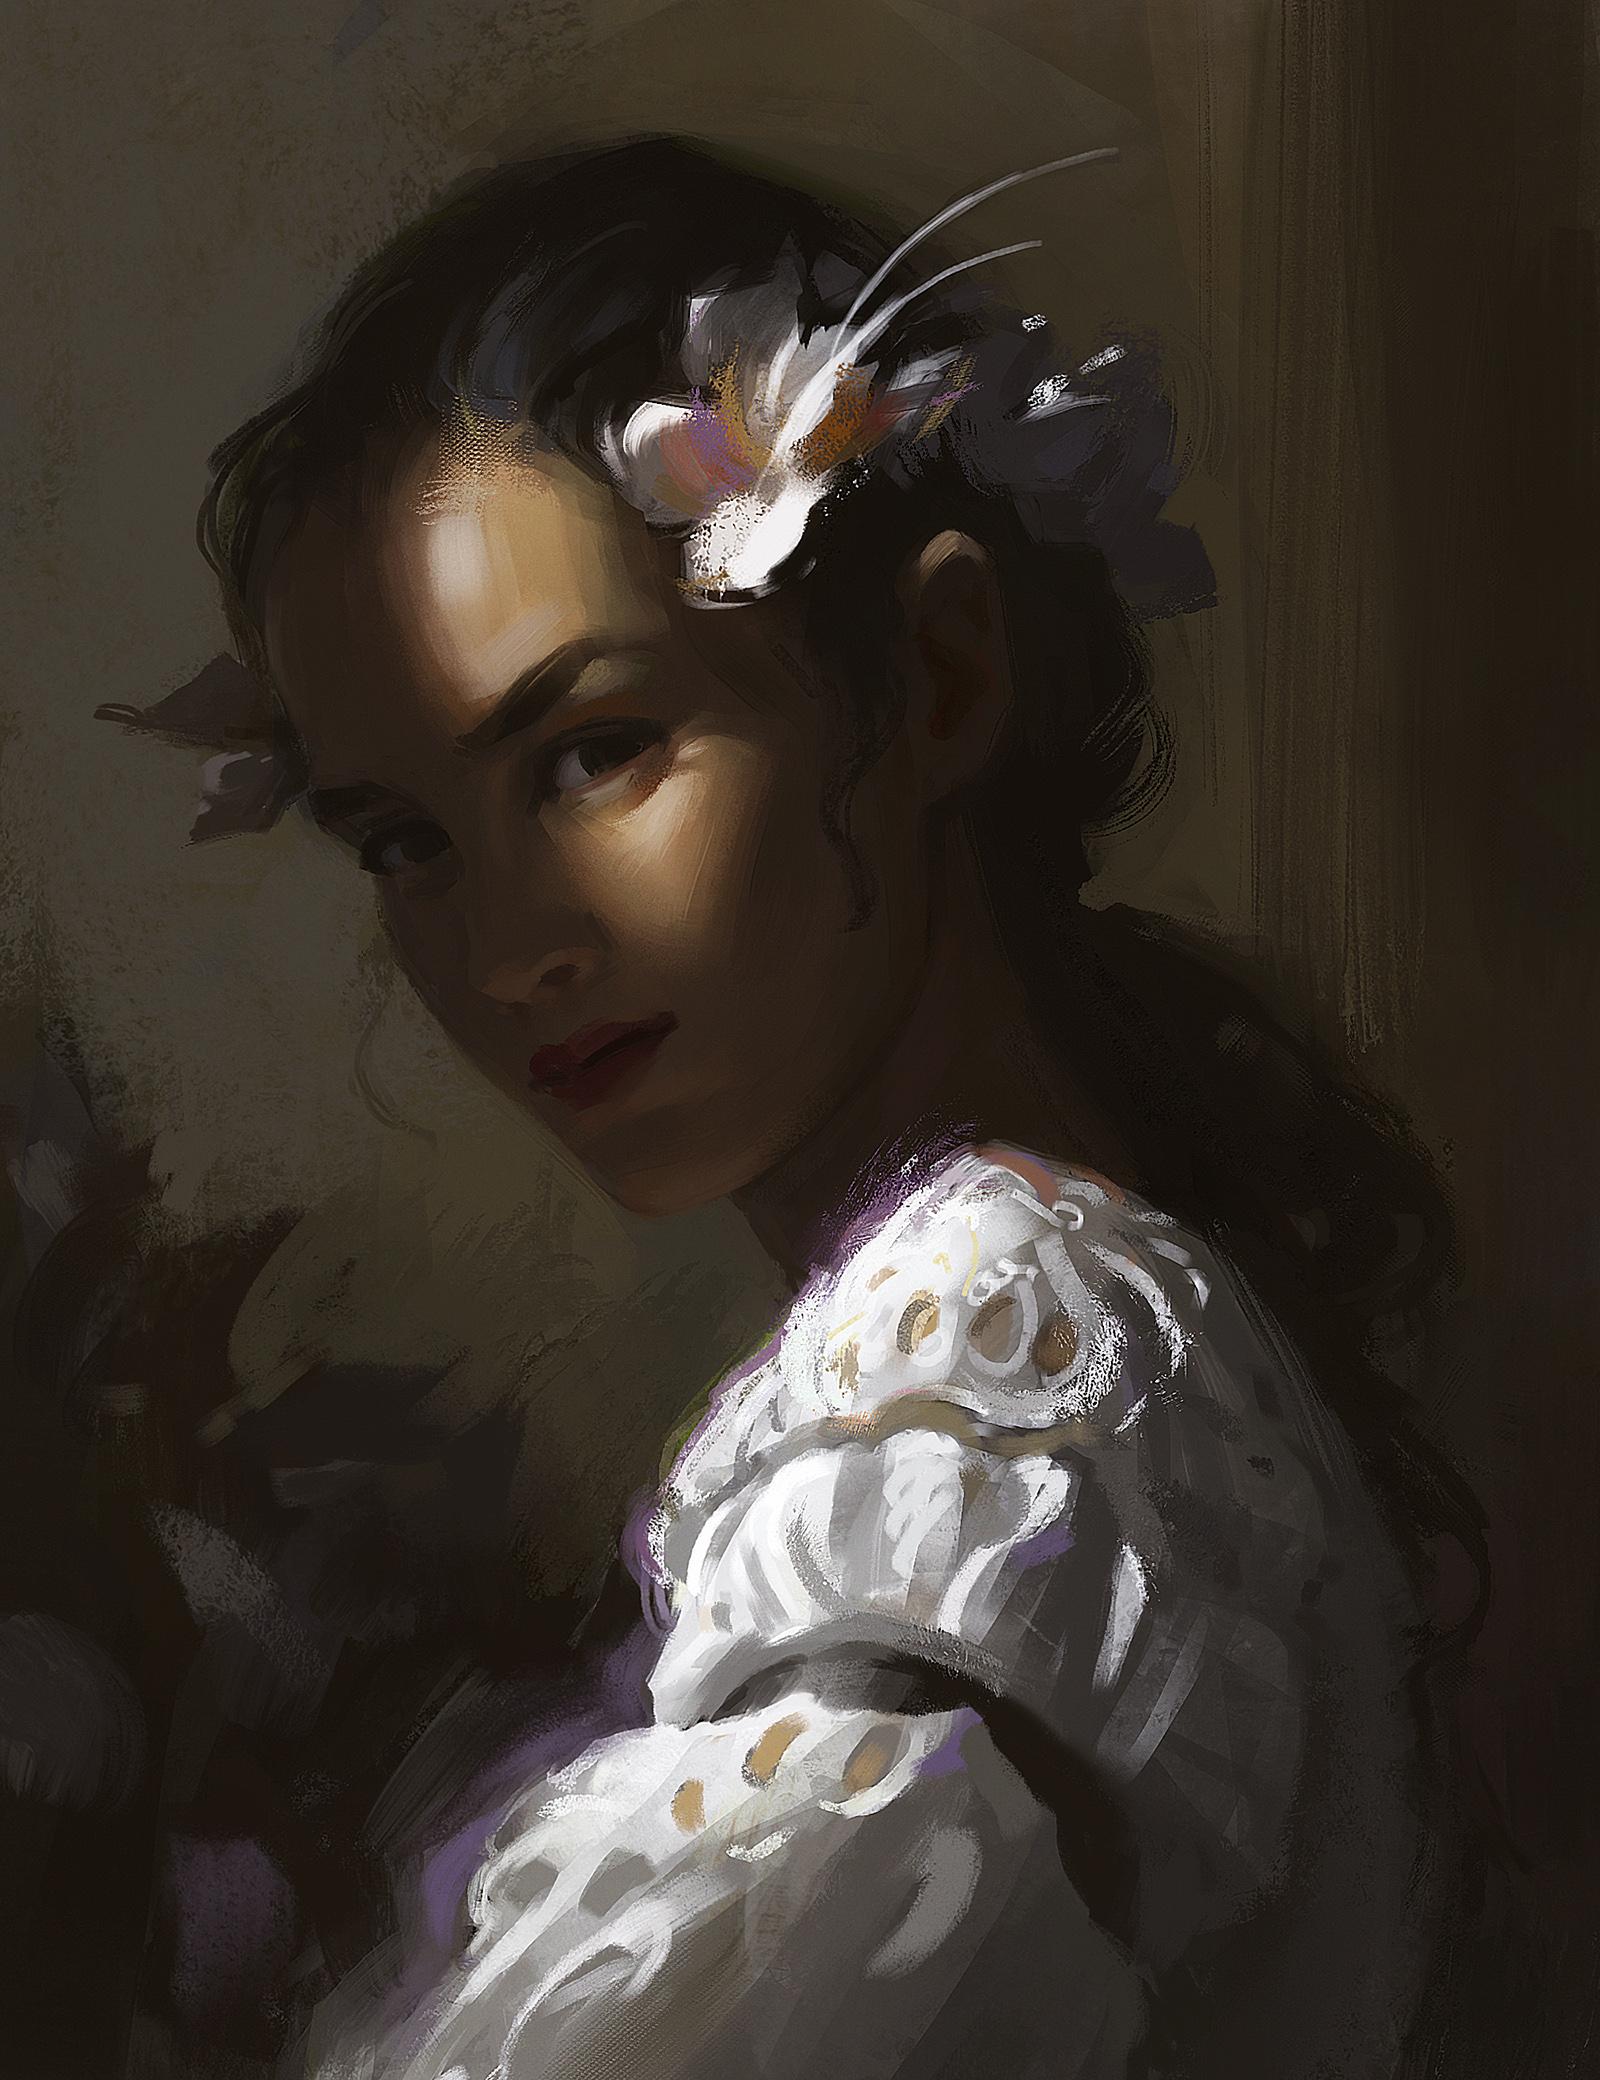 Фото Девушка с цветами на волосах и падающем на нее светом, by Wildweasel339